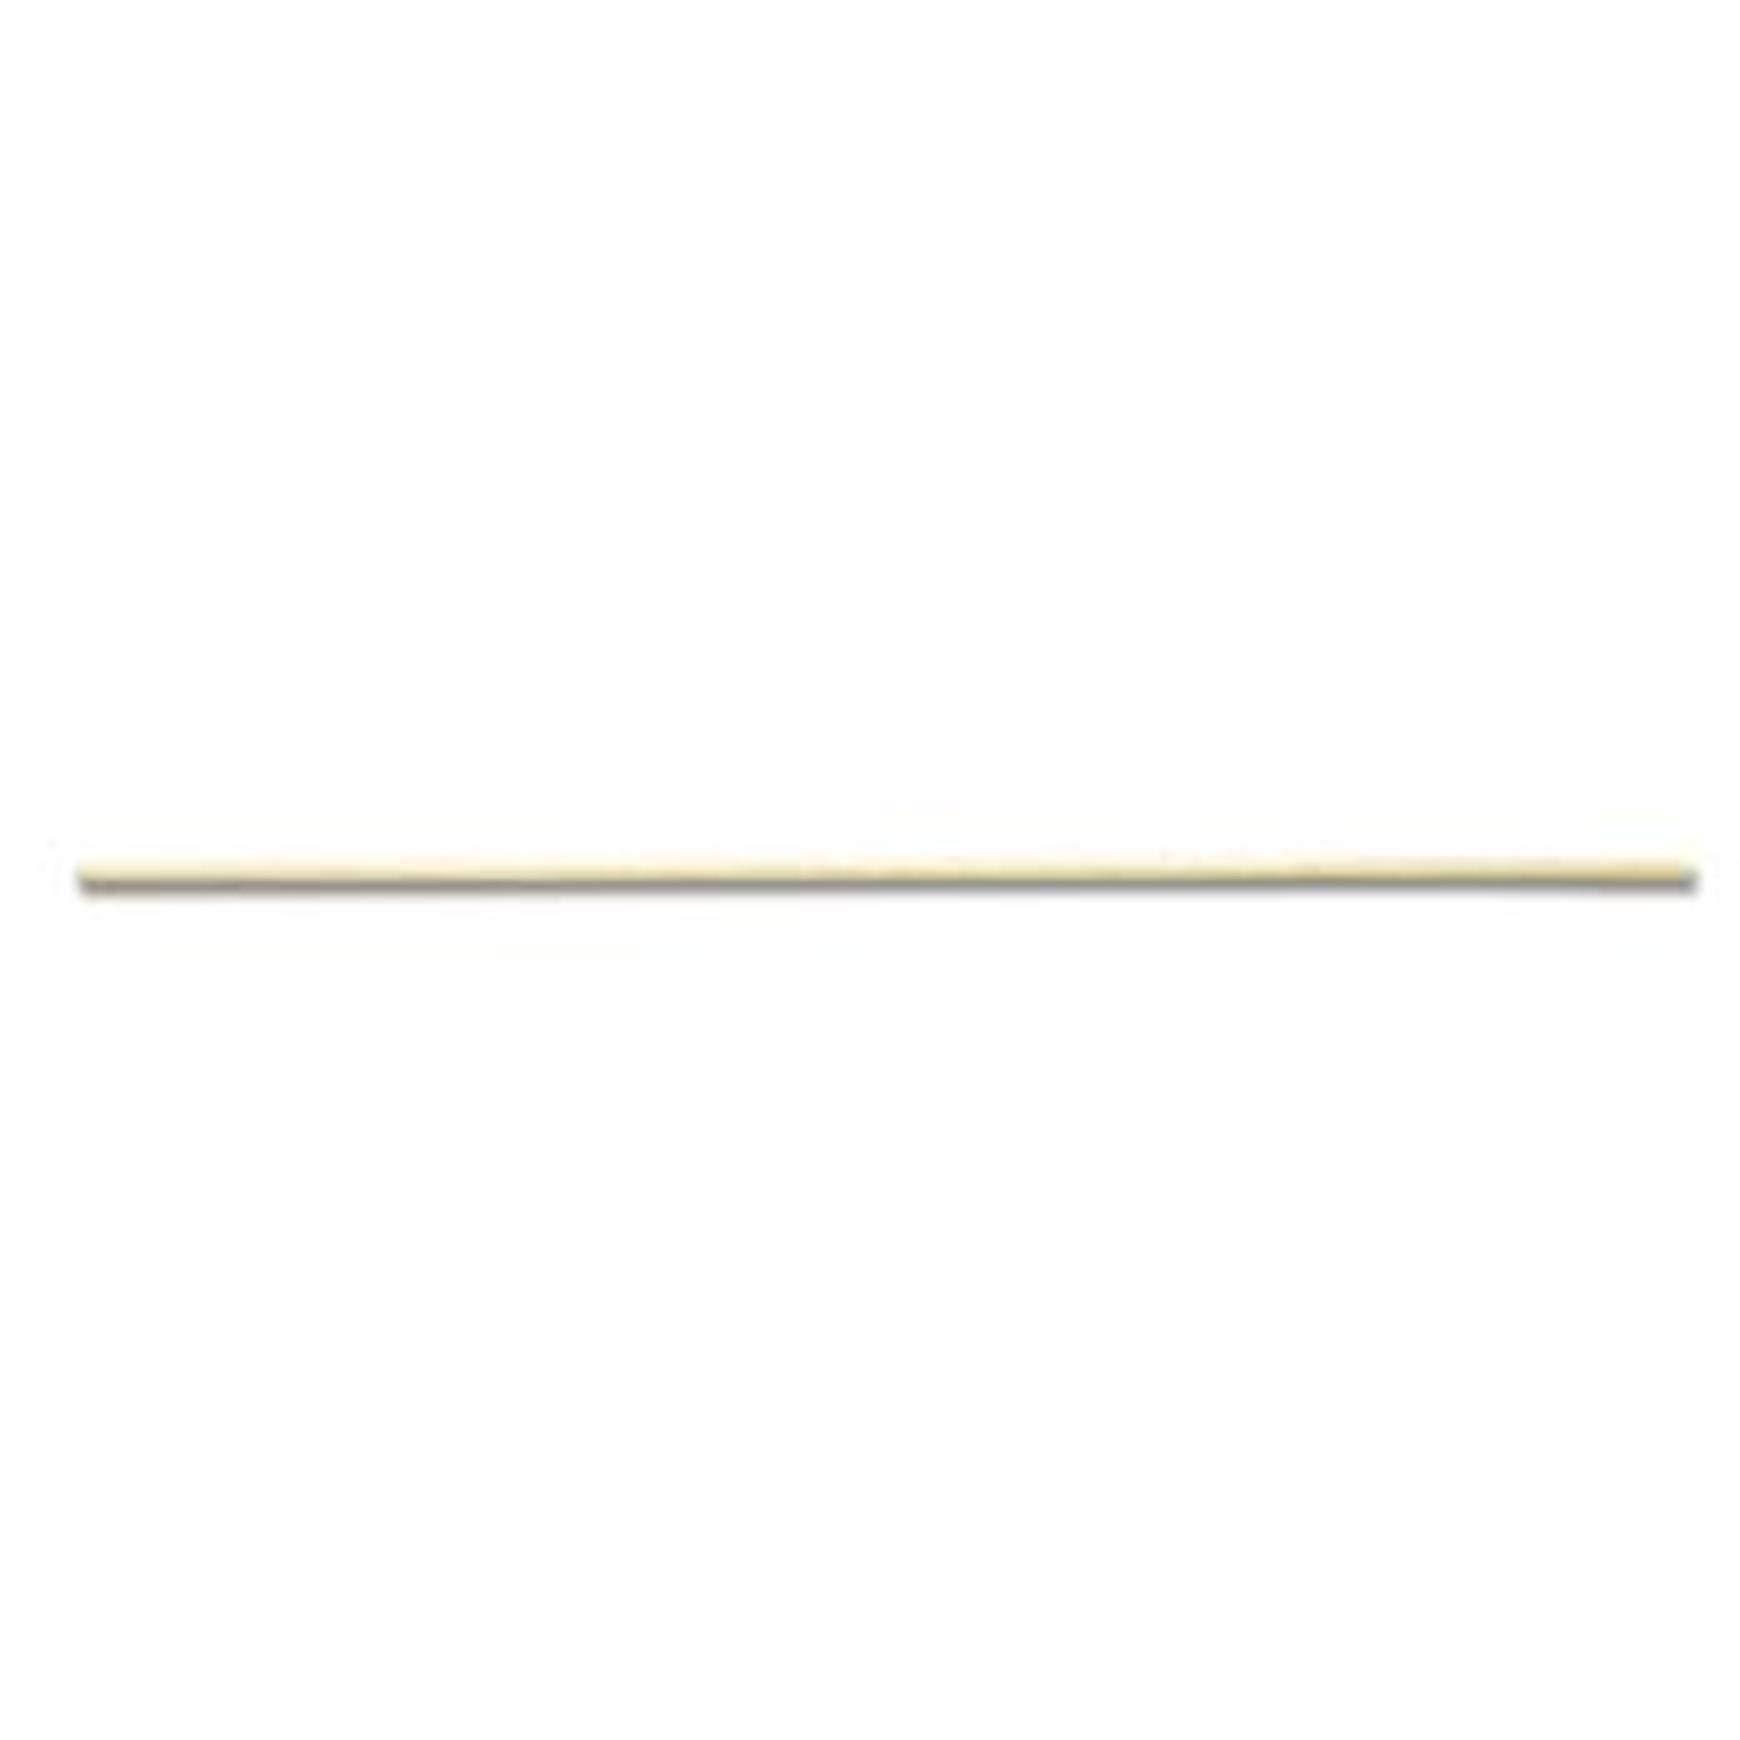 Puritan 807 Non-Sterile Plain Wooden Applicators Stick (Case of 20000)